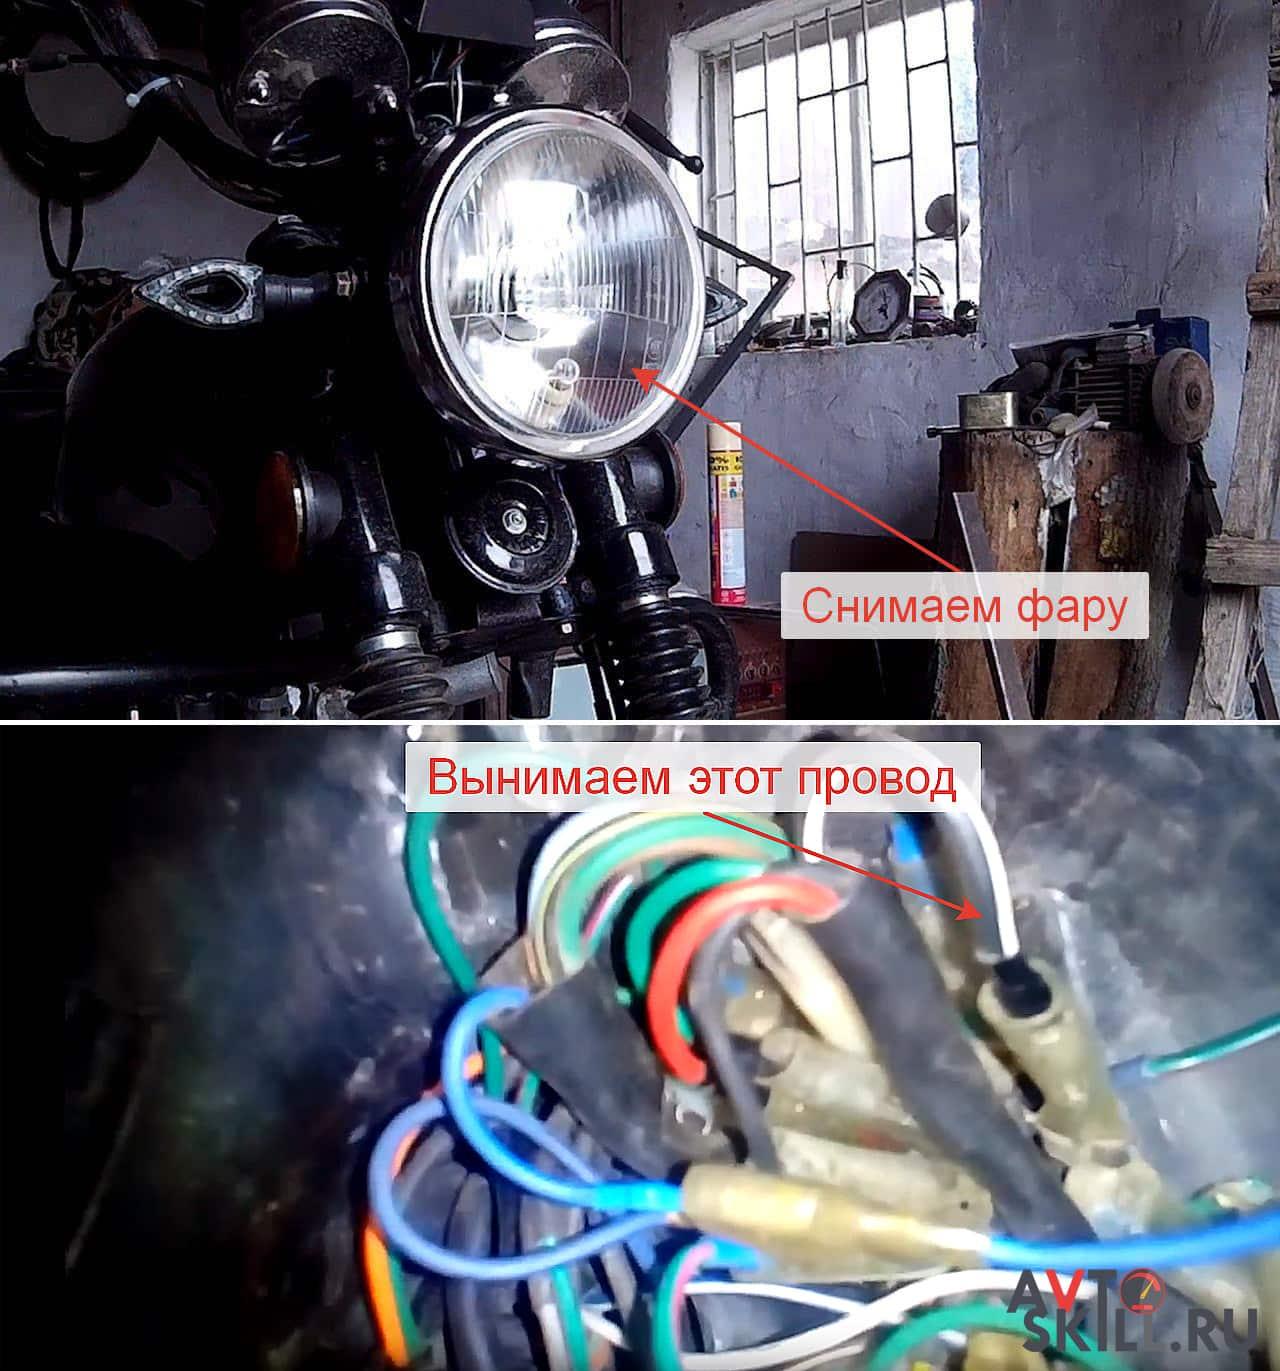 Как завести мопед без ключа зажигания | Как завести мопед (или скутер) без ключа зажигания